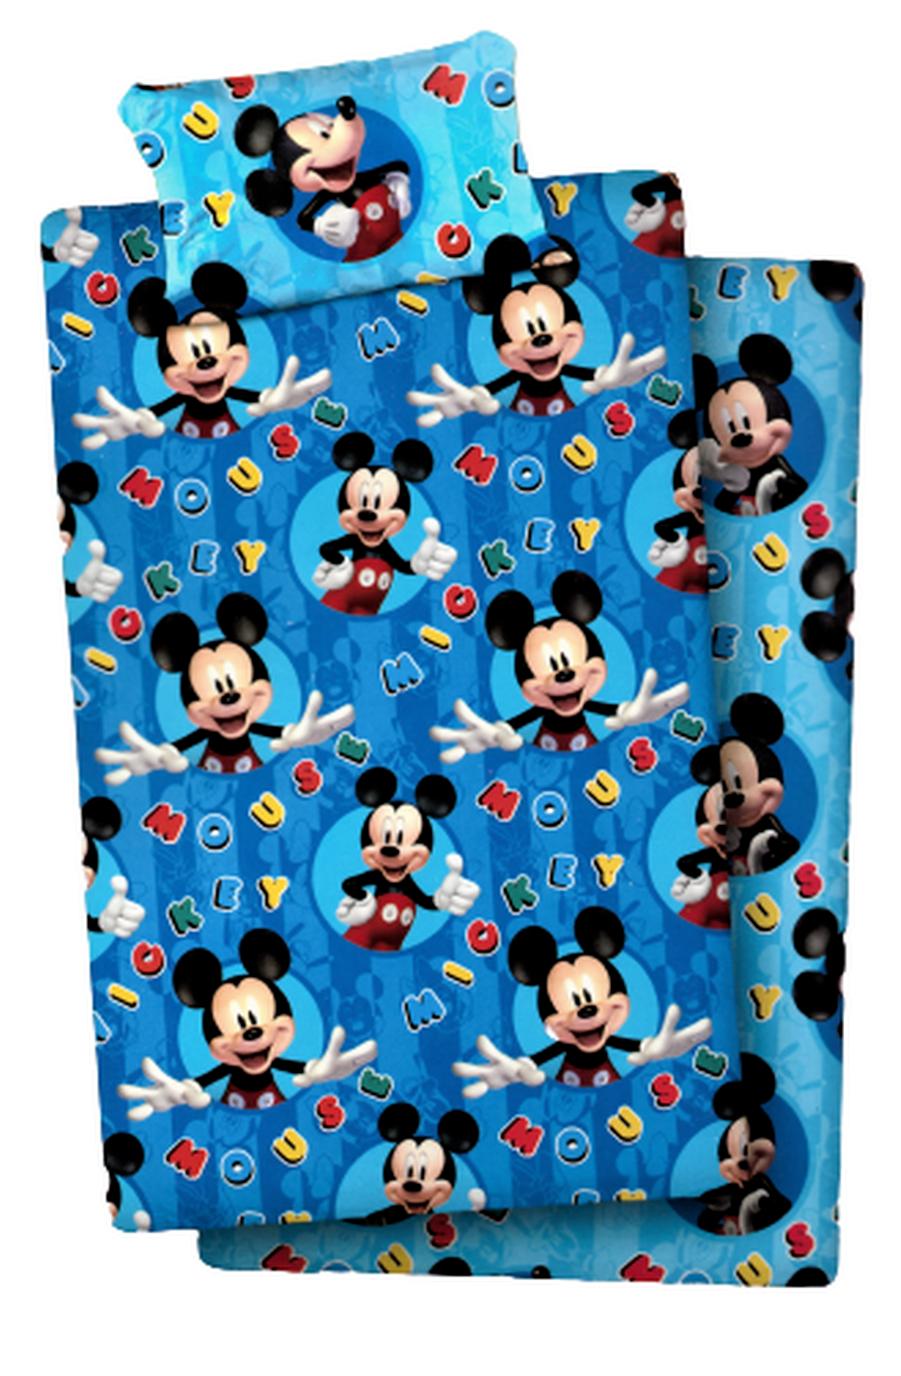 Juego de cama de franela de Mickey Mouse